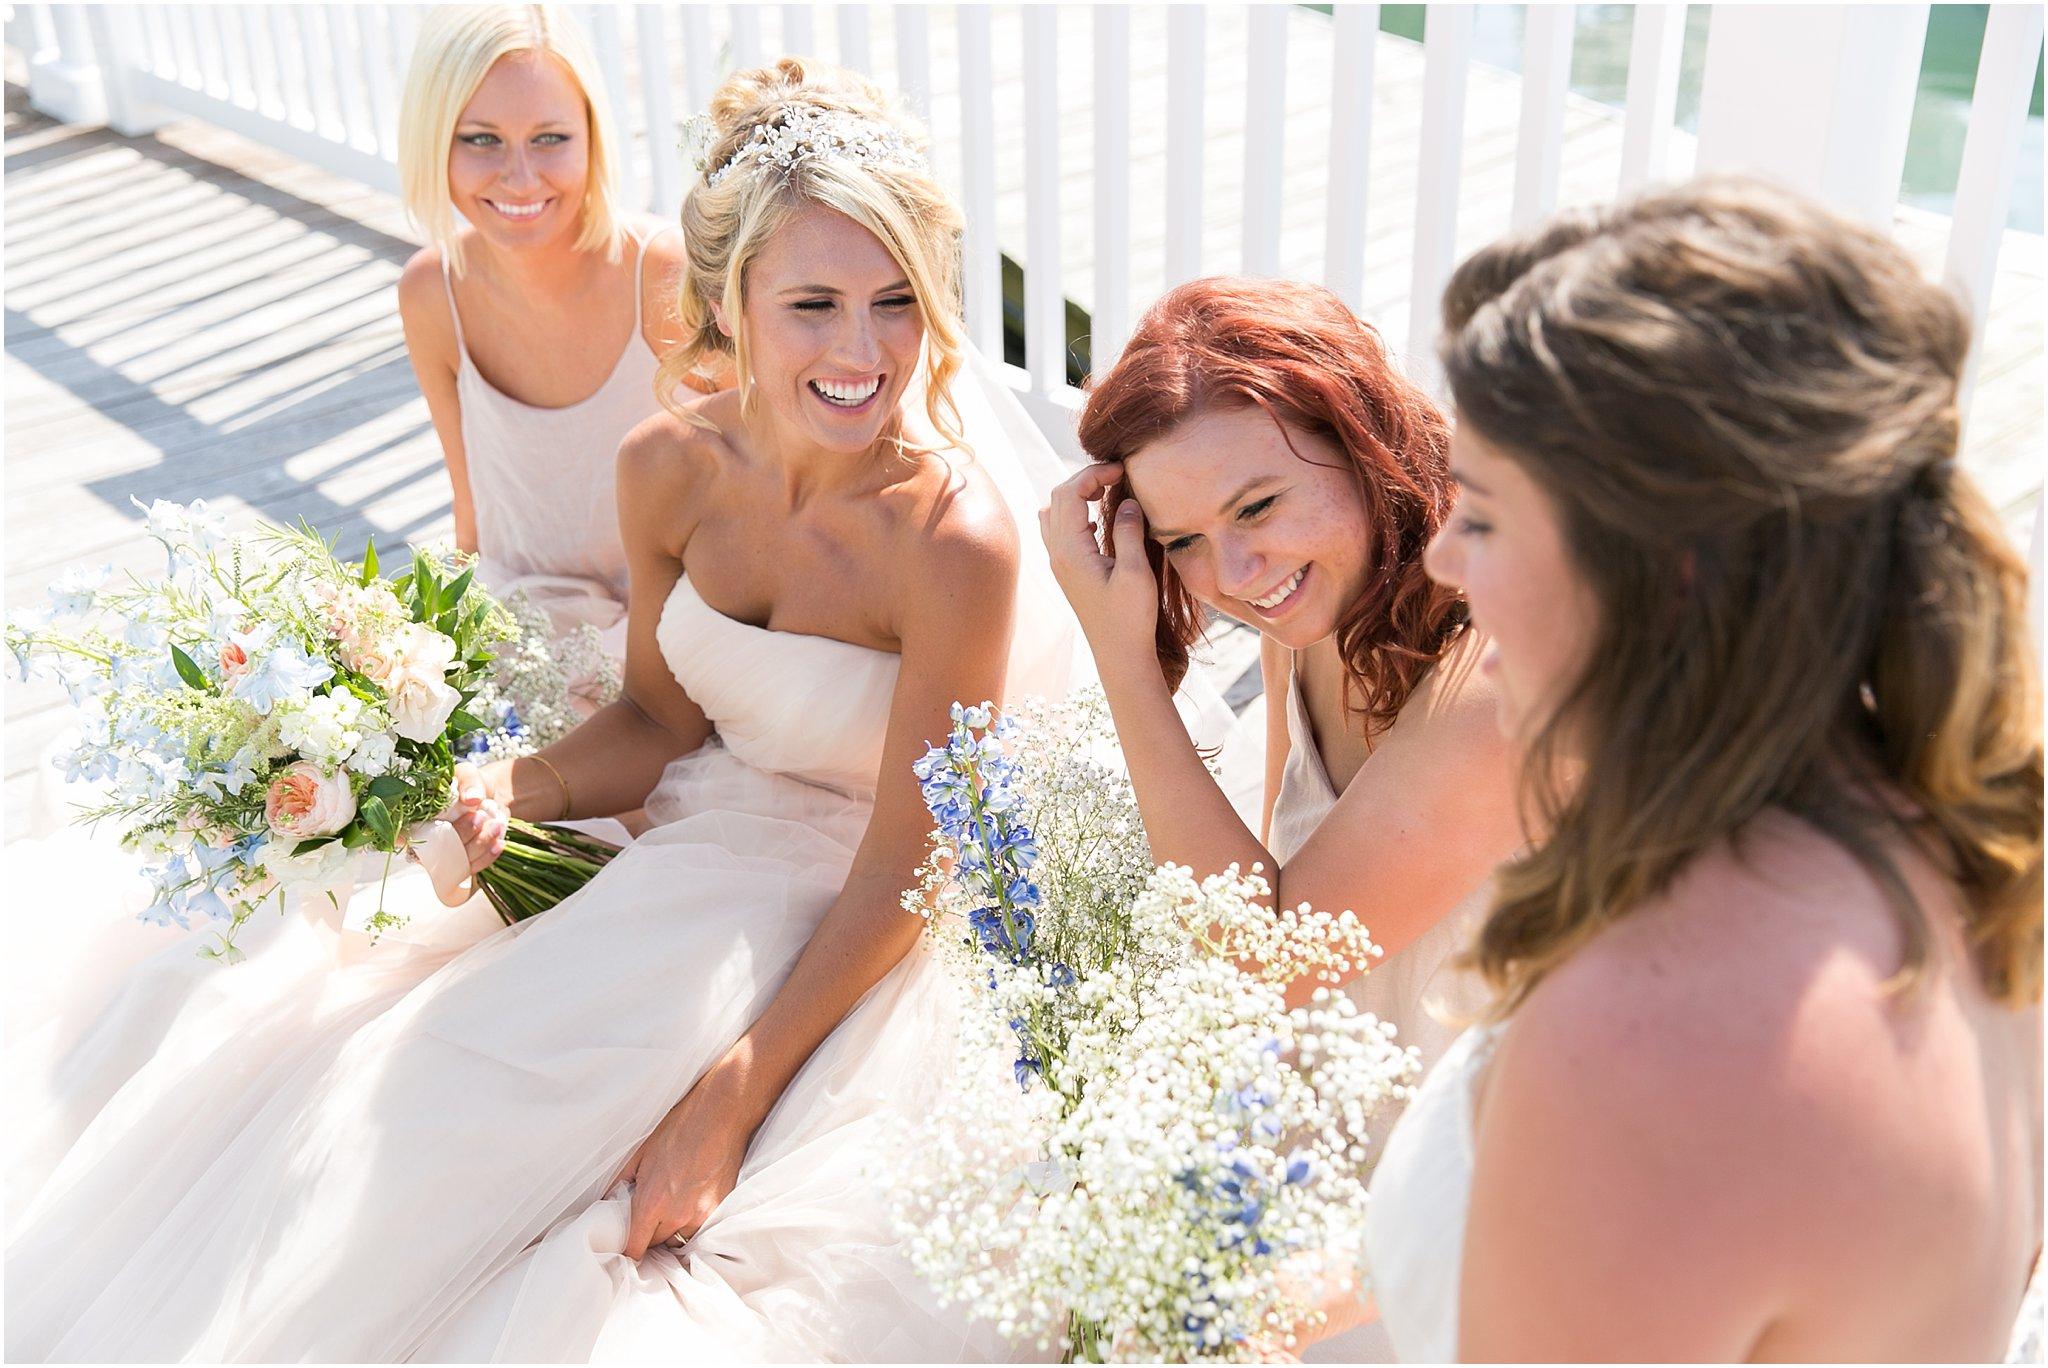 jessica_ryan_photography_wedding_hampton_roads_virginia_virginia_beach_weddings_0615